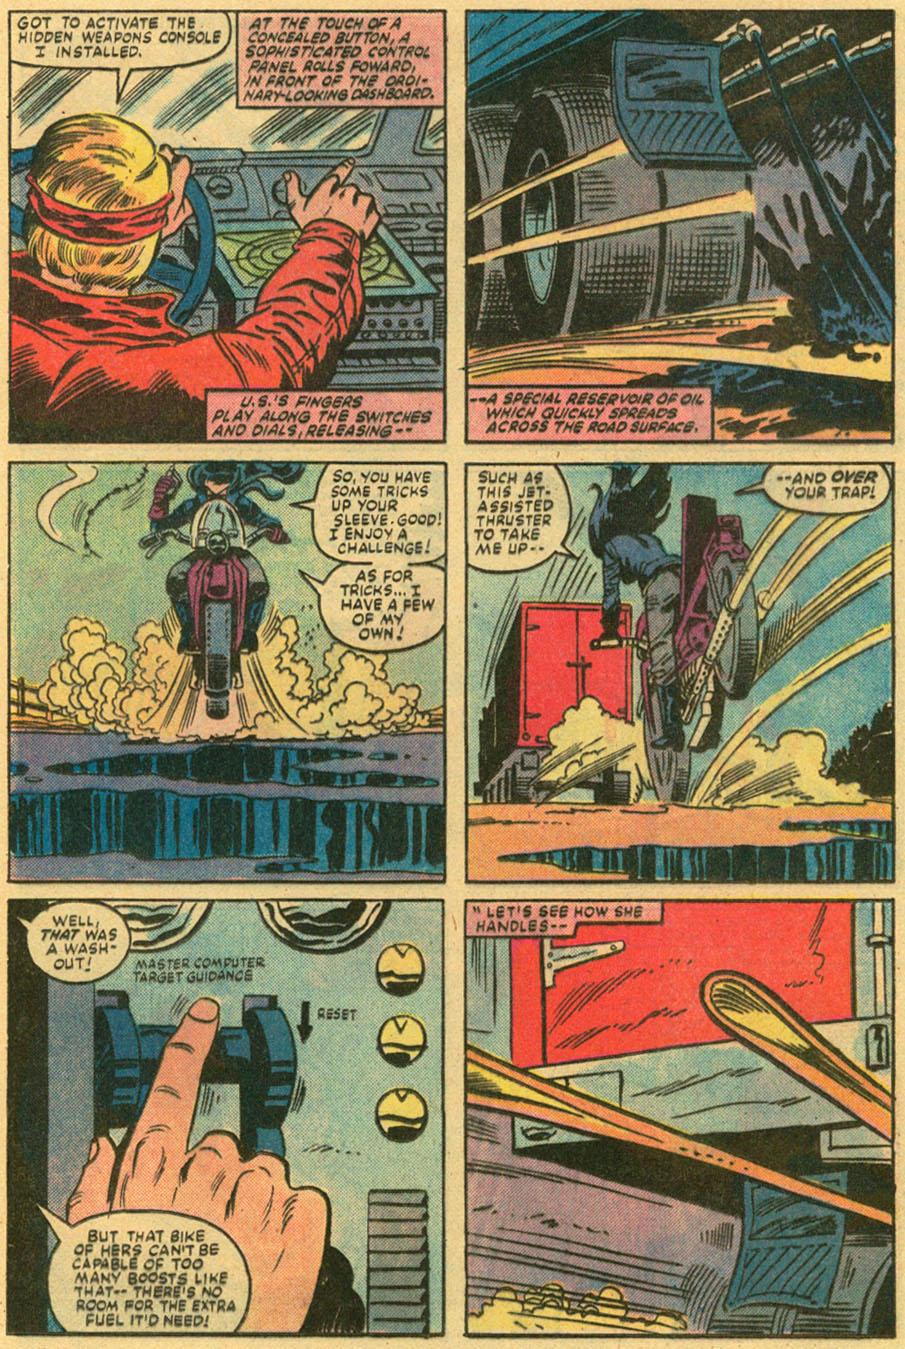 Read online U.S. 1 comic -  Issue #2 - 17